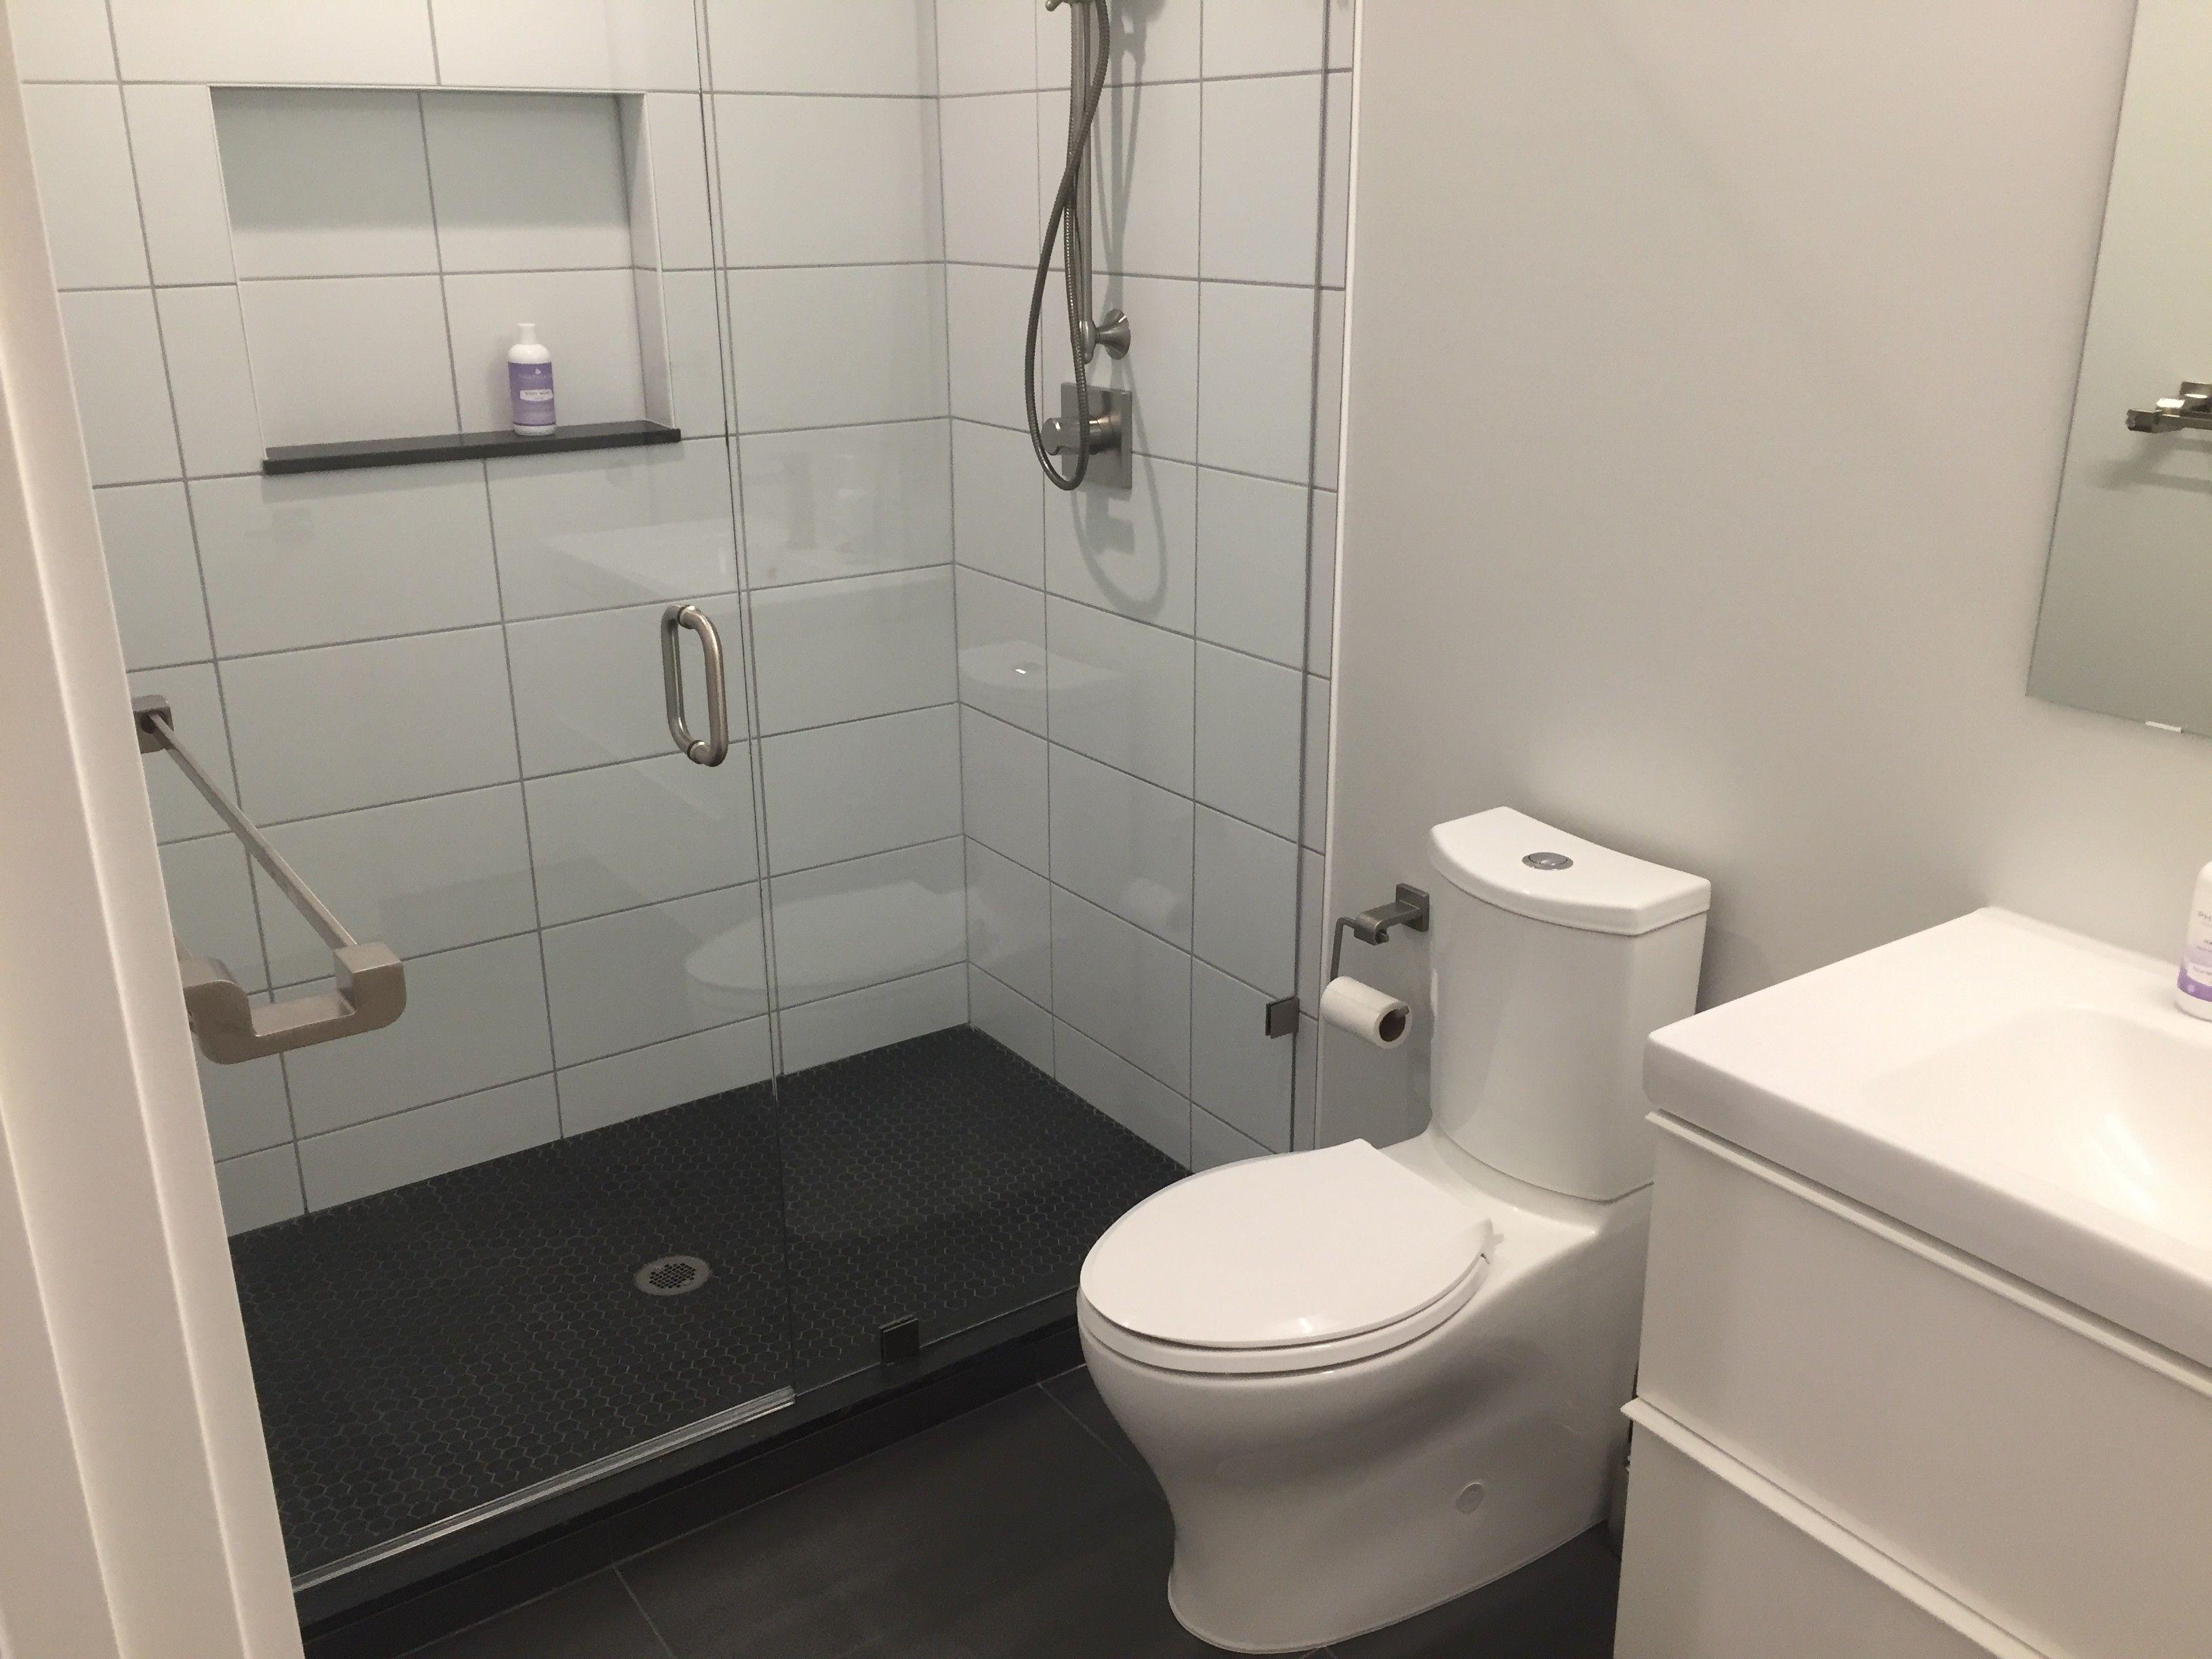 12x24 Iki Floor Tile 10x18 Ice White Wall Tile Black Hexagon Shower Pan White Wall Tiles Shower Pan White Walls